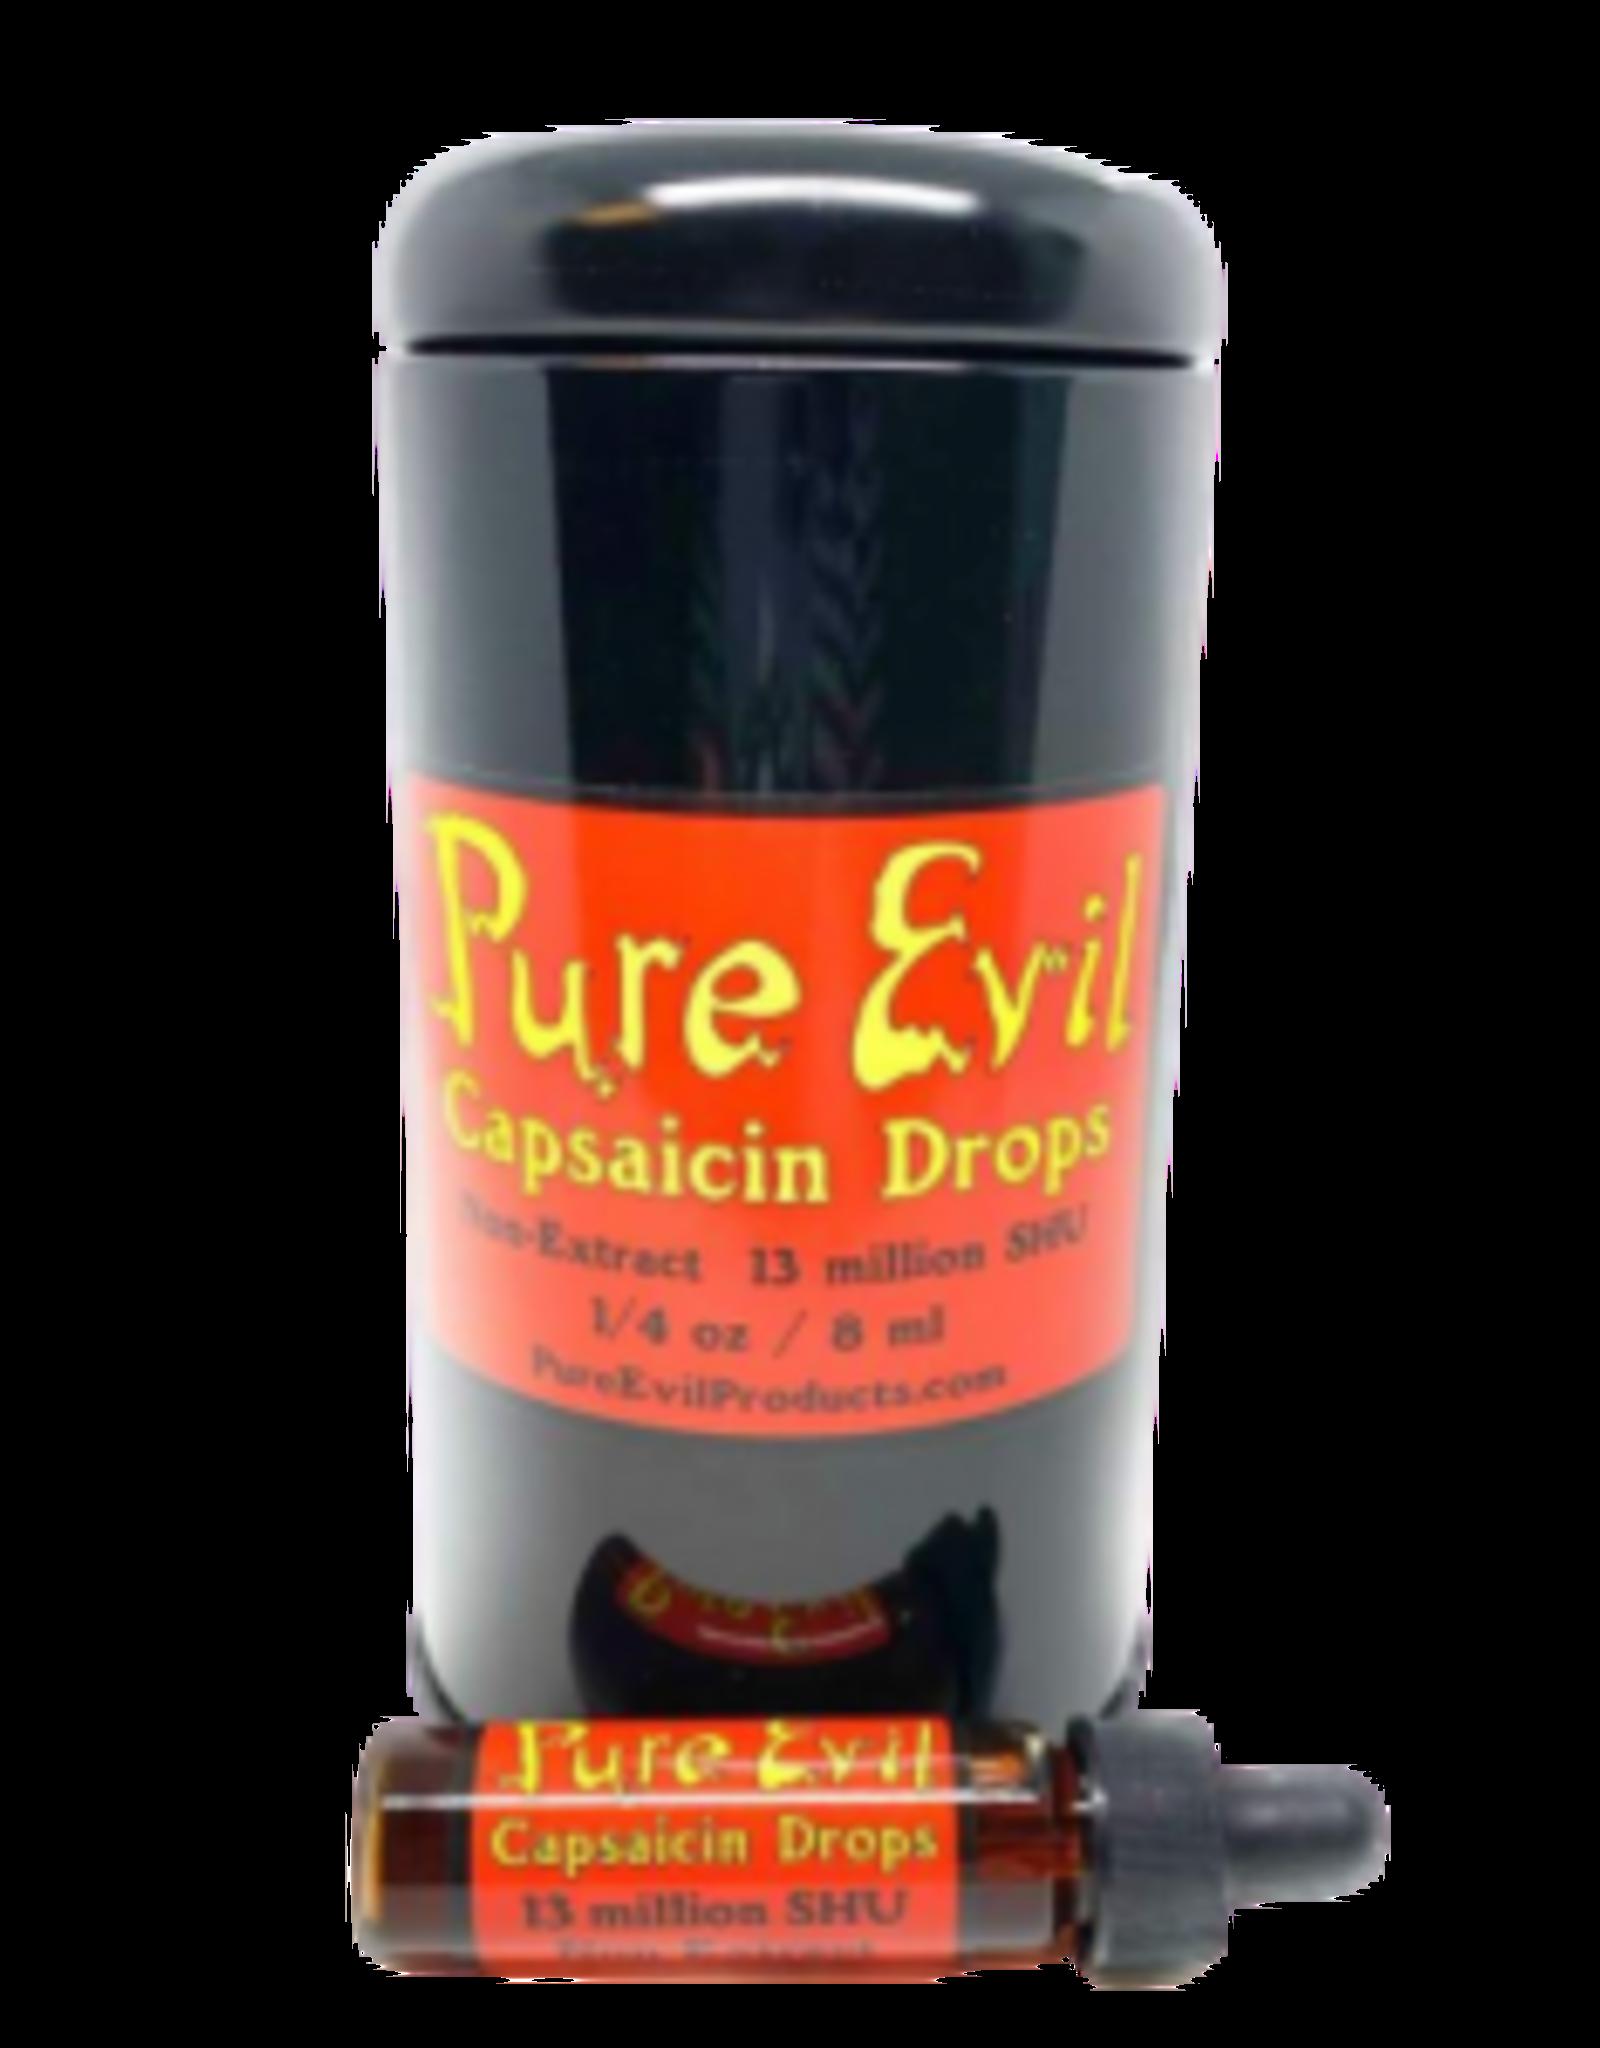 Pure Evil 13 Million SHU Capsaicin Drops